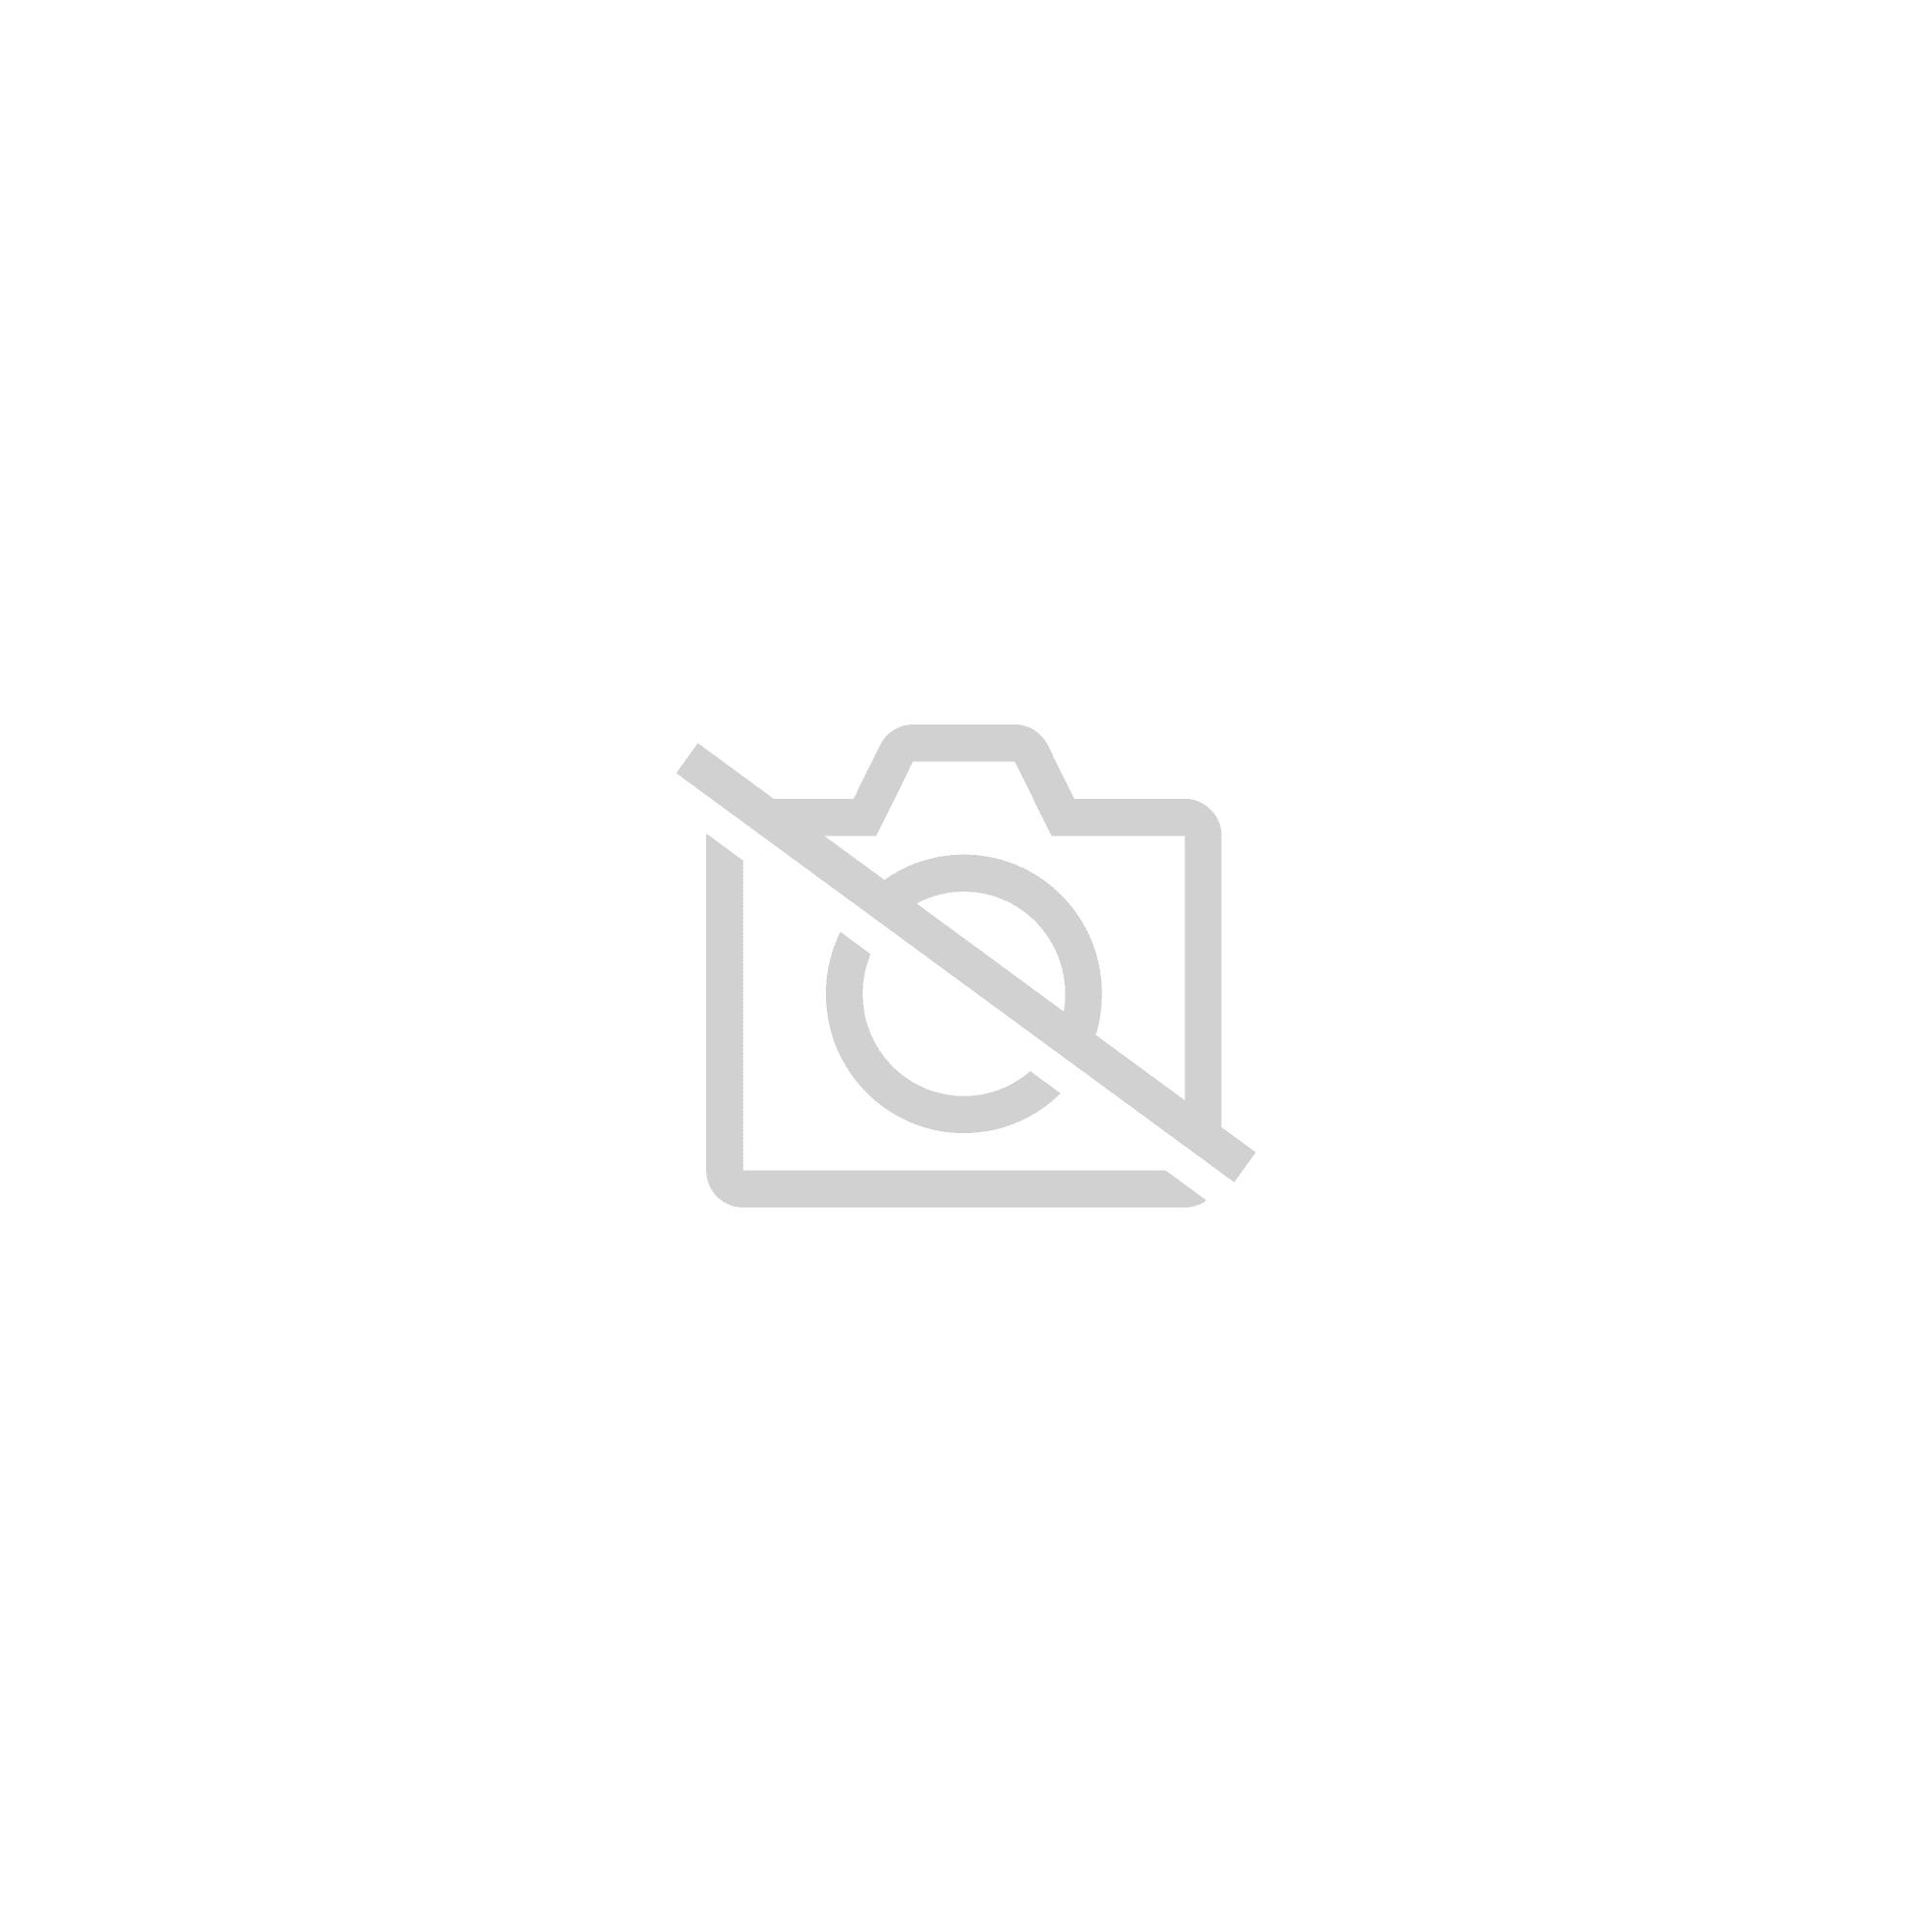 [DON/ECH] Le gros foutoir DVD [MAJ 11/01] 908530976